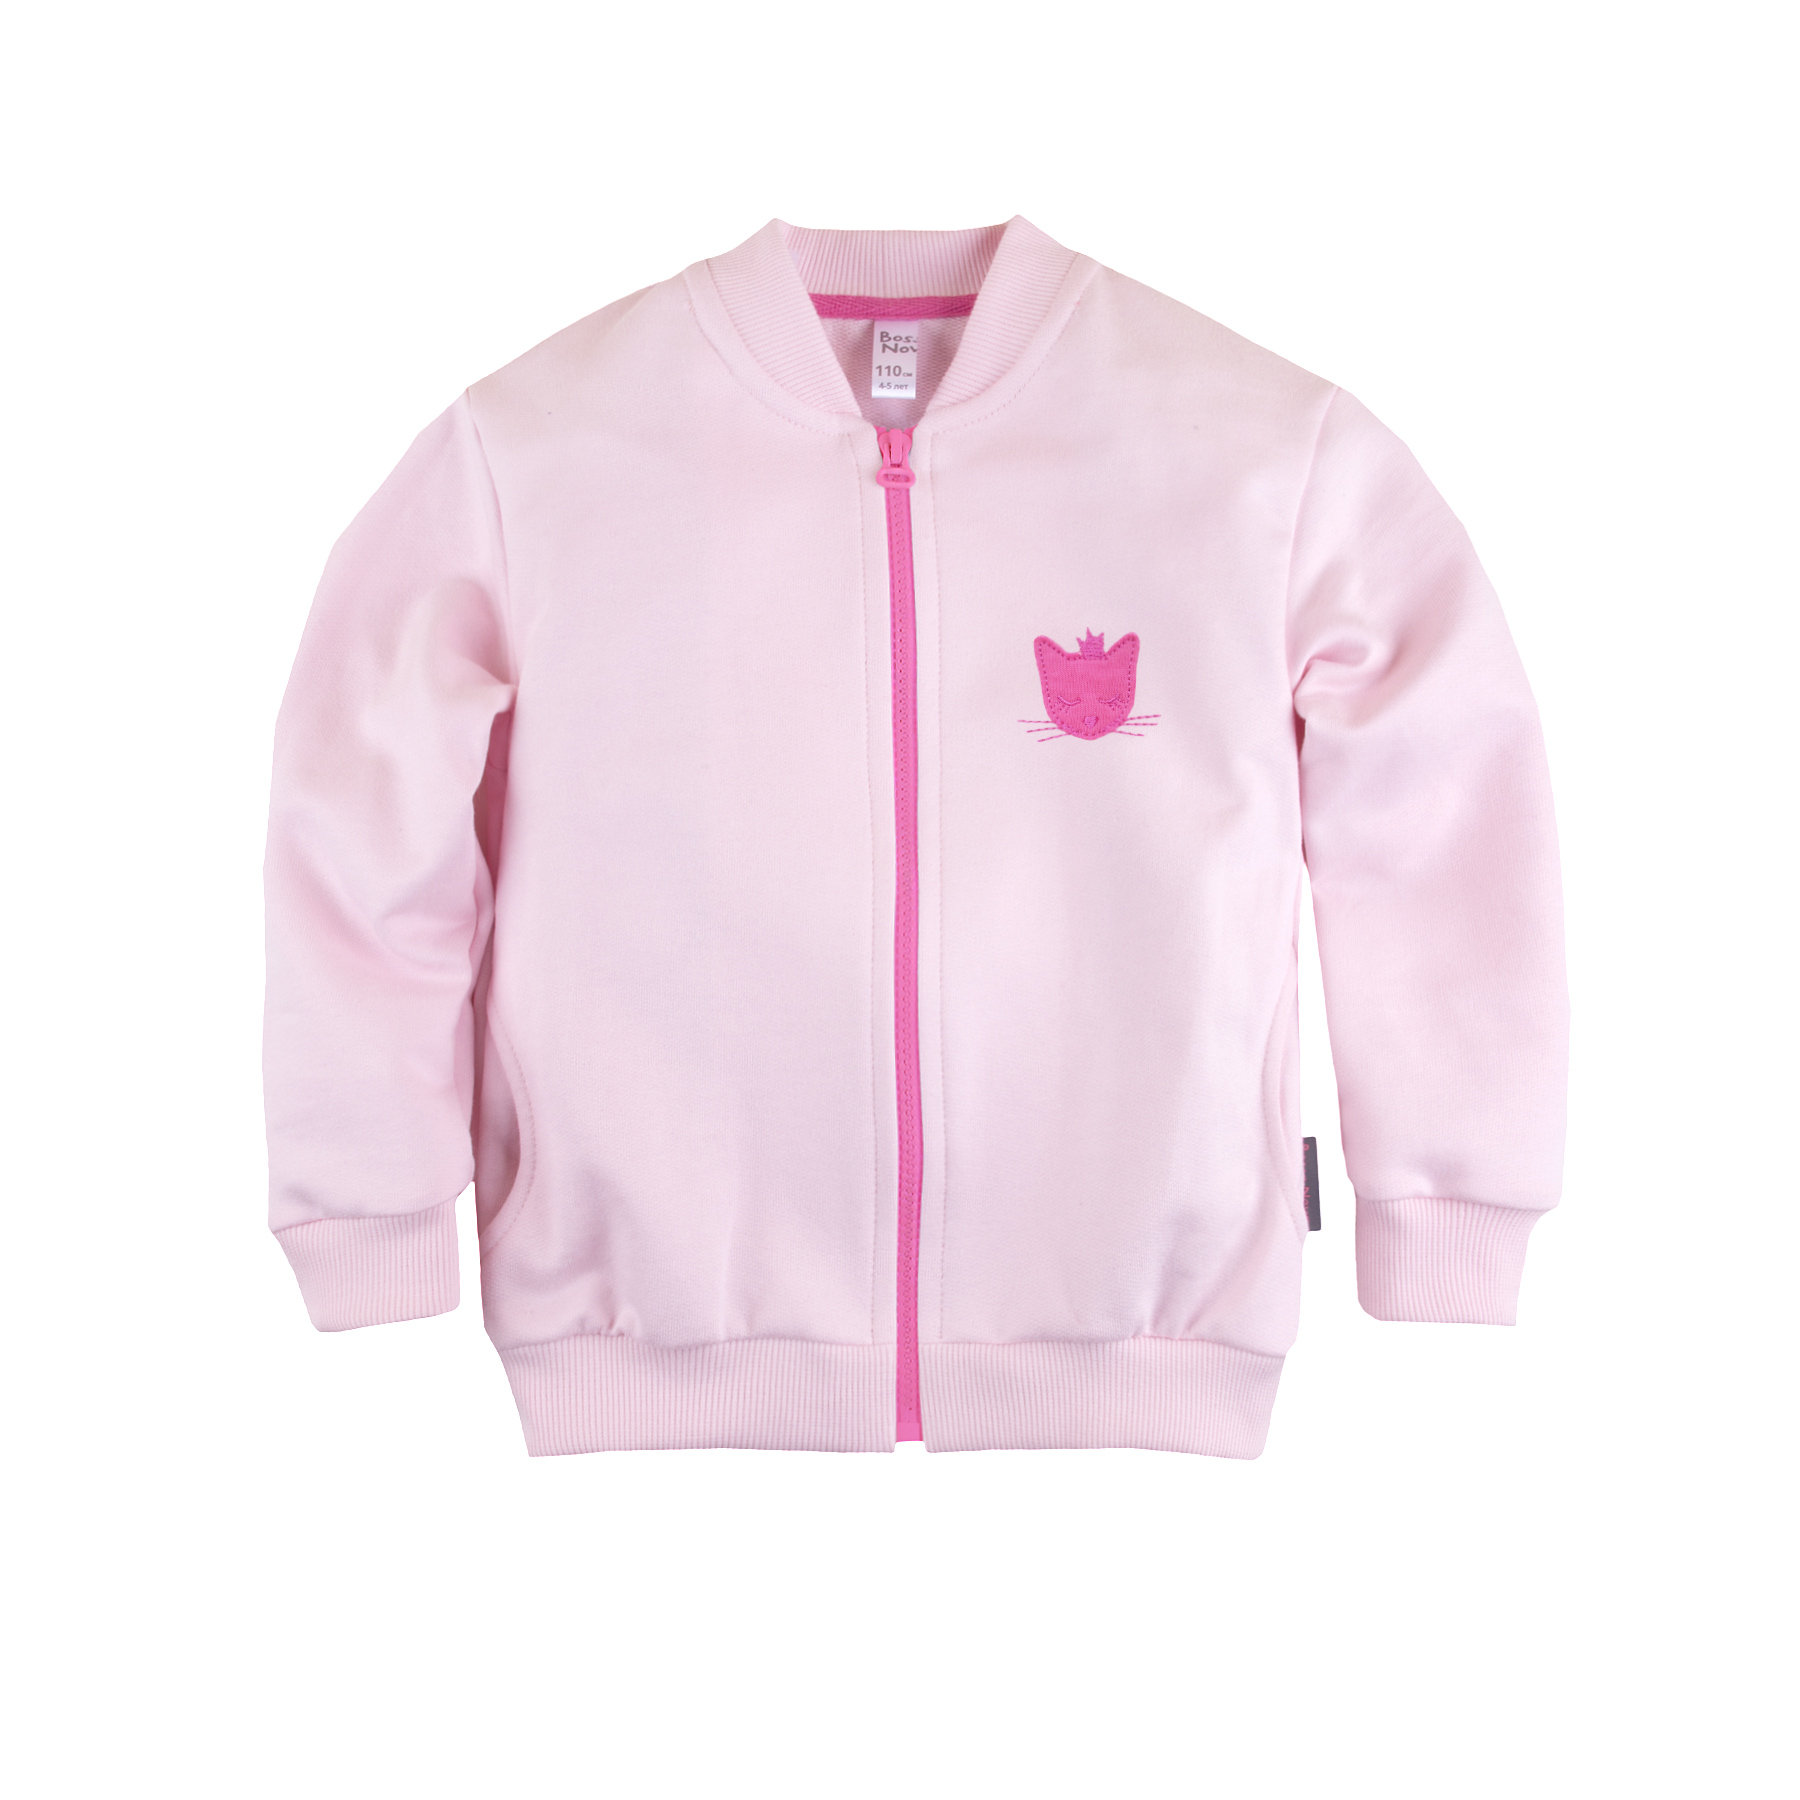 Bomber Jacket for girls 'Mocha' BOSSA NOVA 201B-461 jacket 1903441 02